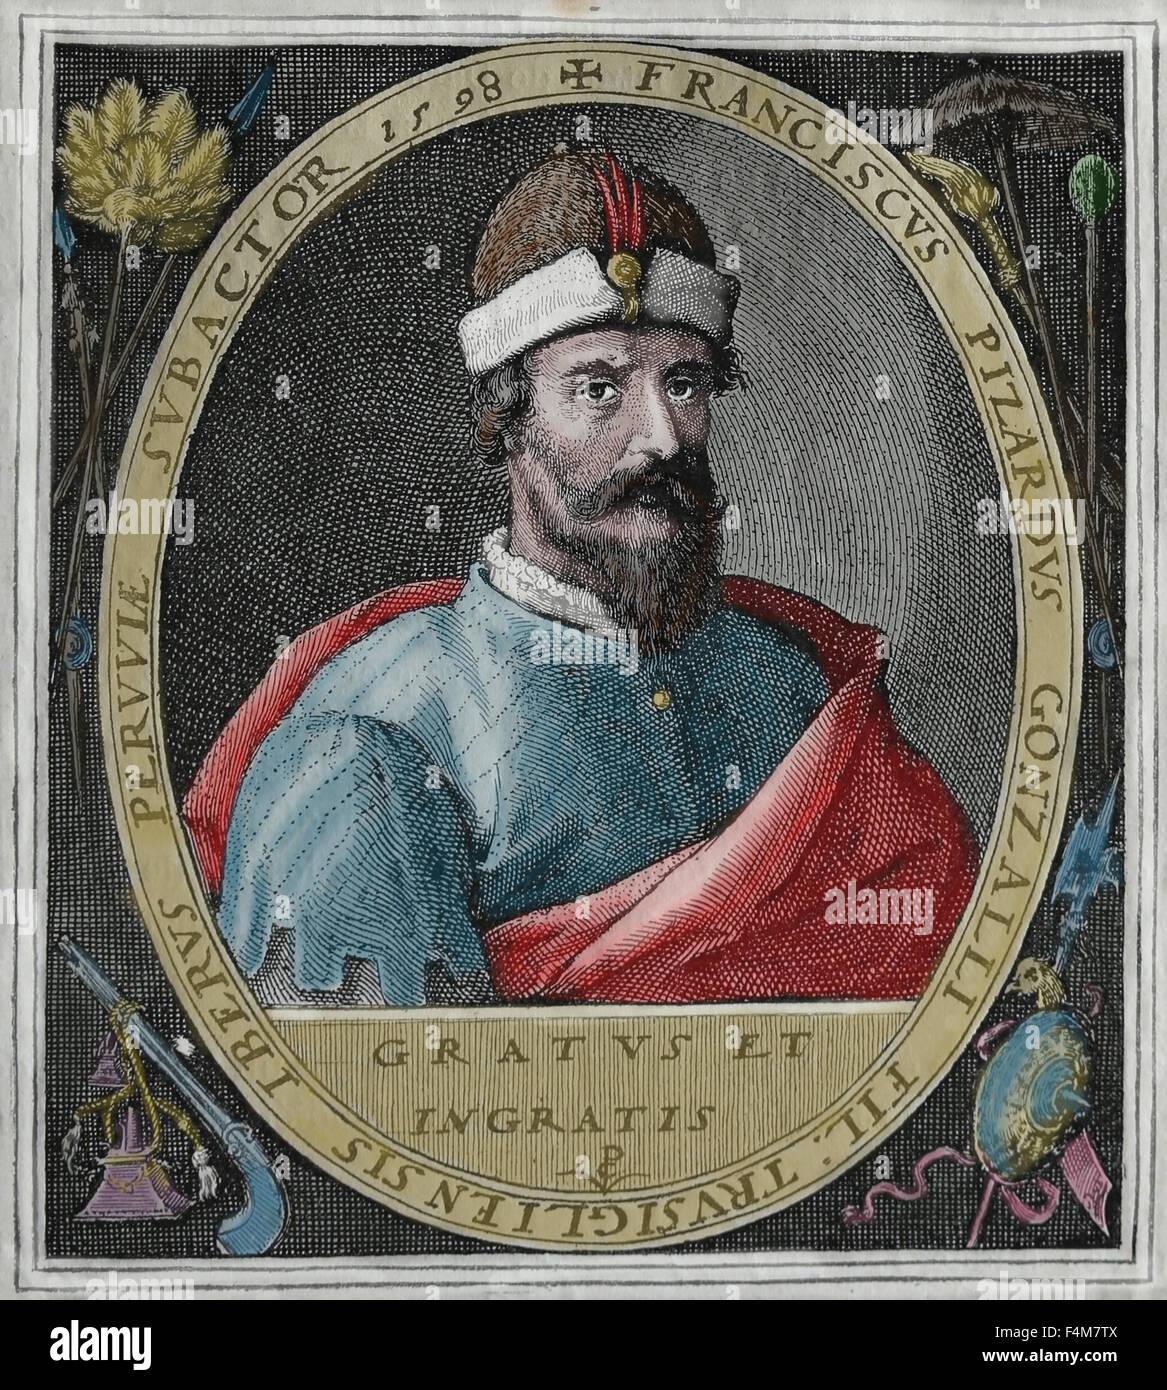 Francisco Pizarro (1471-1541). The Spanish conqueror of the Inca Empire. Portrait. Engraving, 16th century. Later - Stock Image